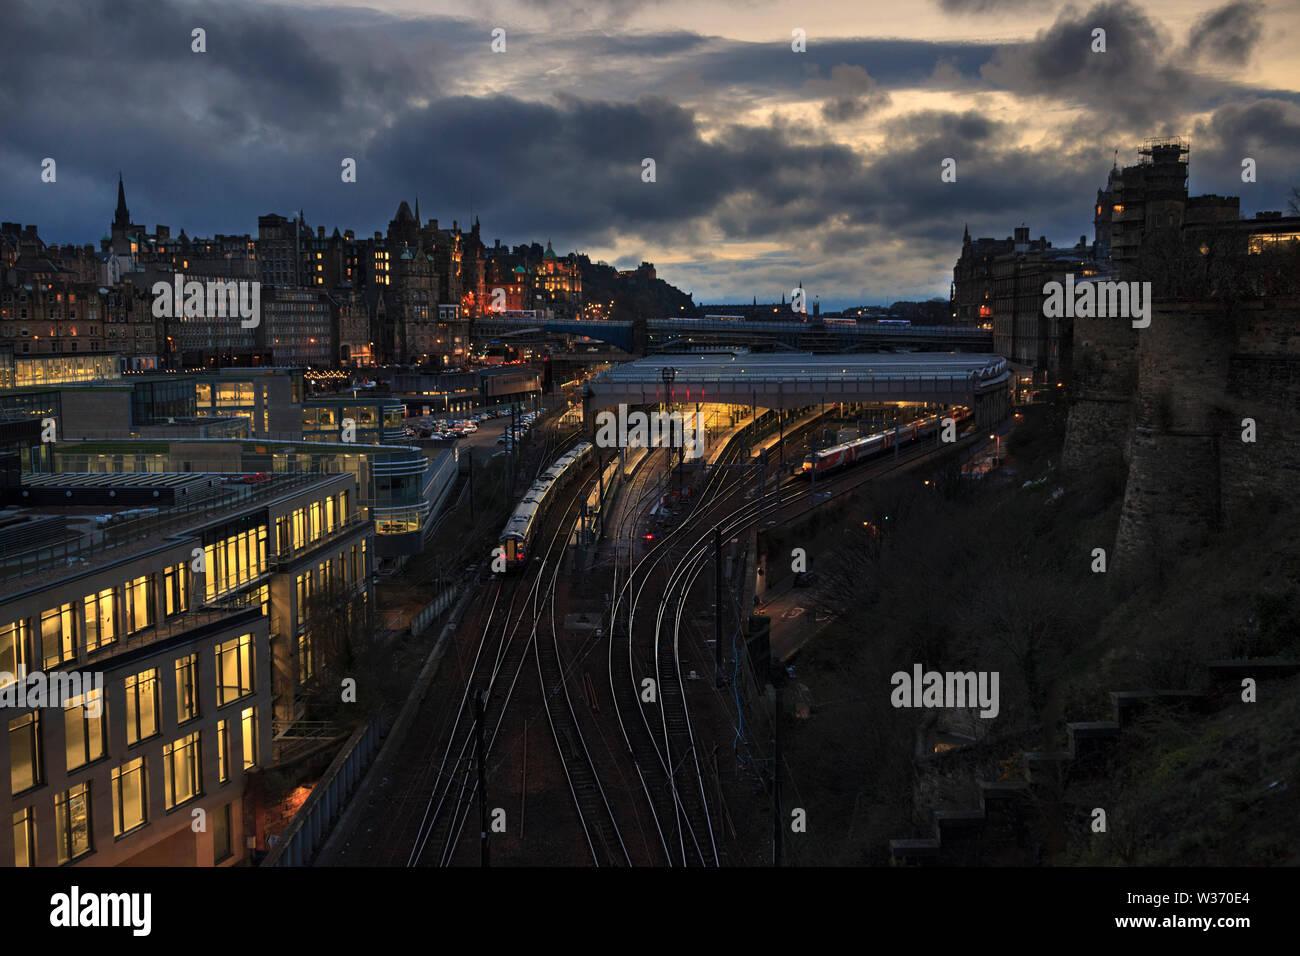 A Abellio Scotrail class 380 train arriving at  Edinburgh Waverley stations east end  at sunset with the Edinburgh skyline Stock Photo